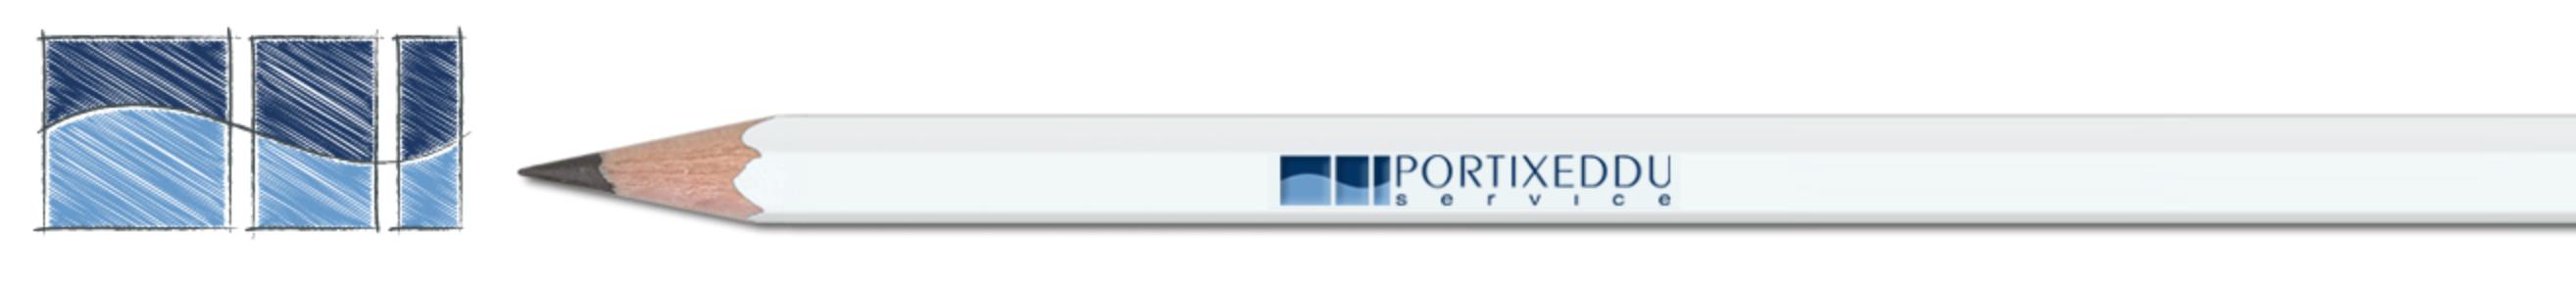 Portixeddu Service S.r.l. – Impresa edile di costruzione, ristrutturazione, vendita, e affitto a Fluminimaggiore – Buggerru